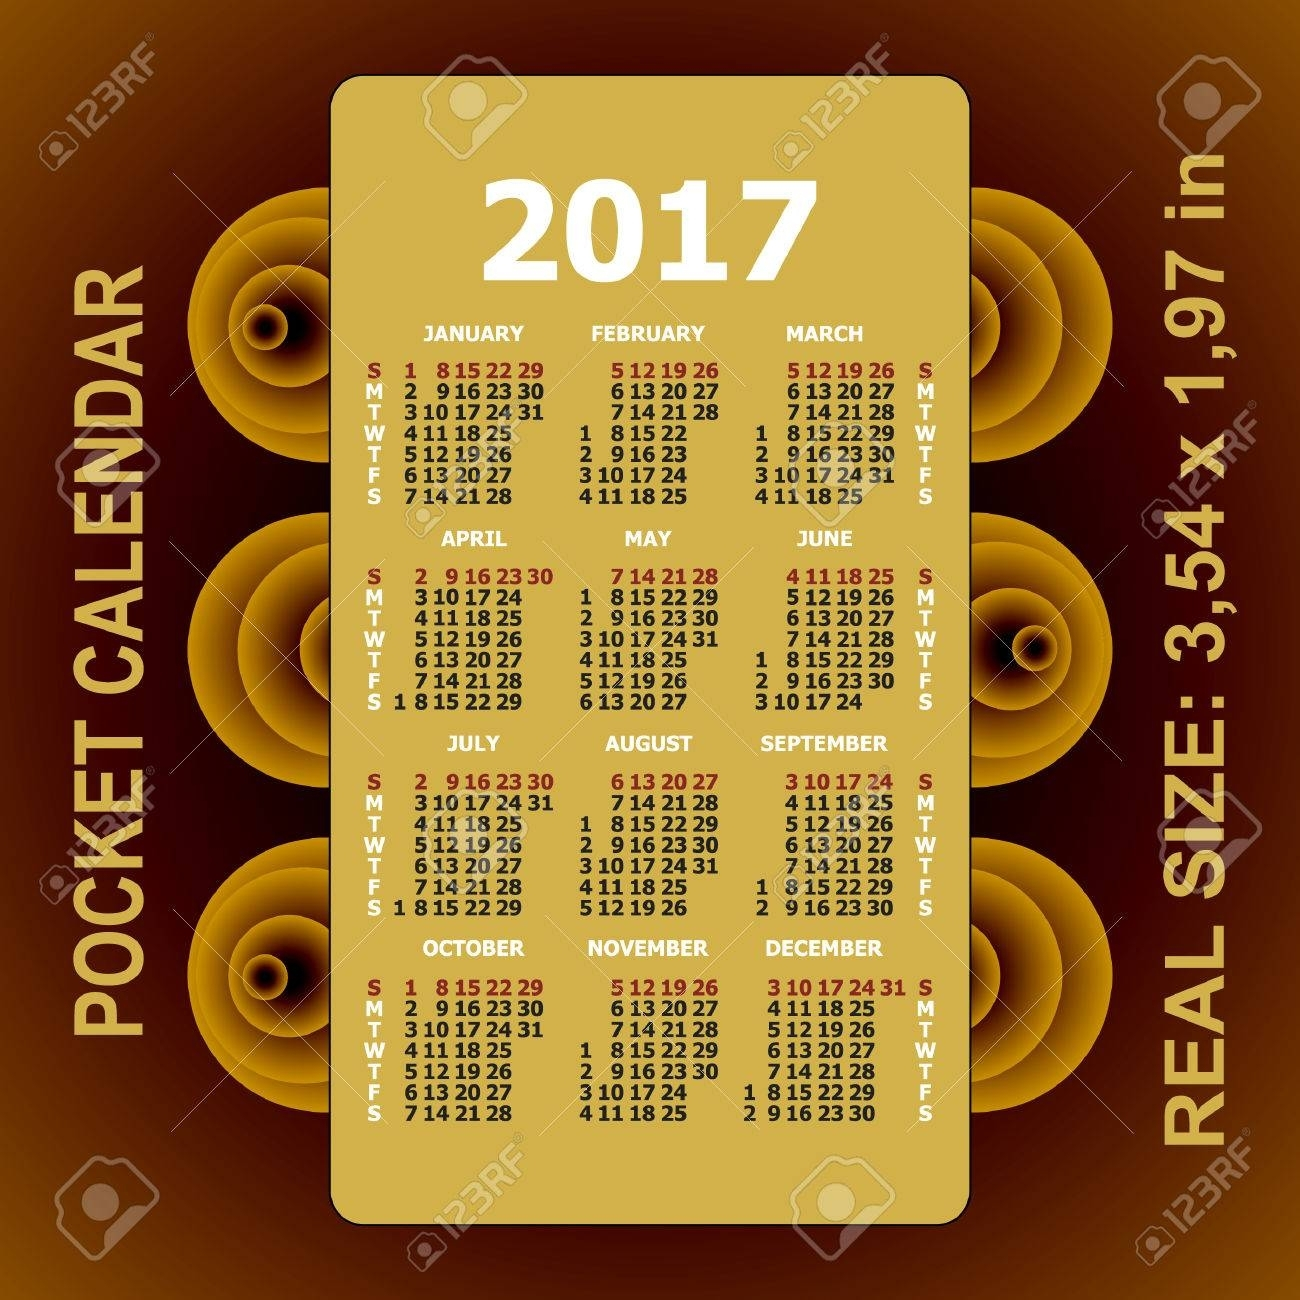 2017 Pocket Calendar. Template Calendar Grid. Vertical Orientation throughout Grid Of 31 Days Image